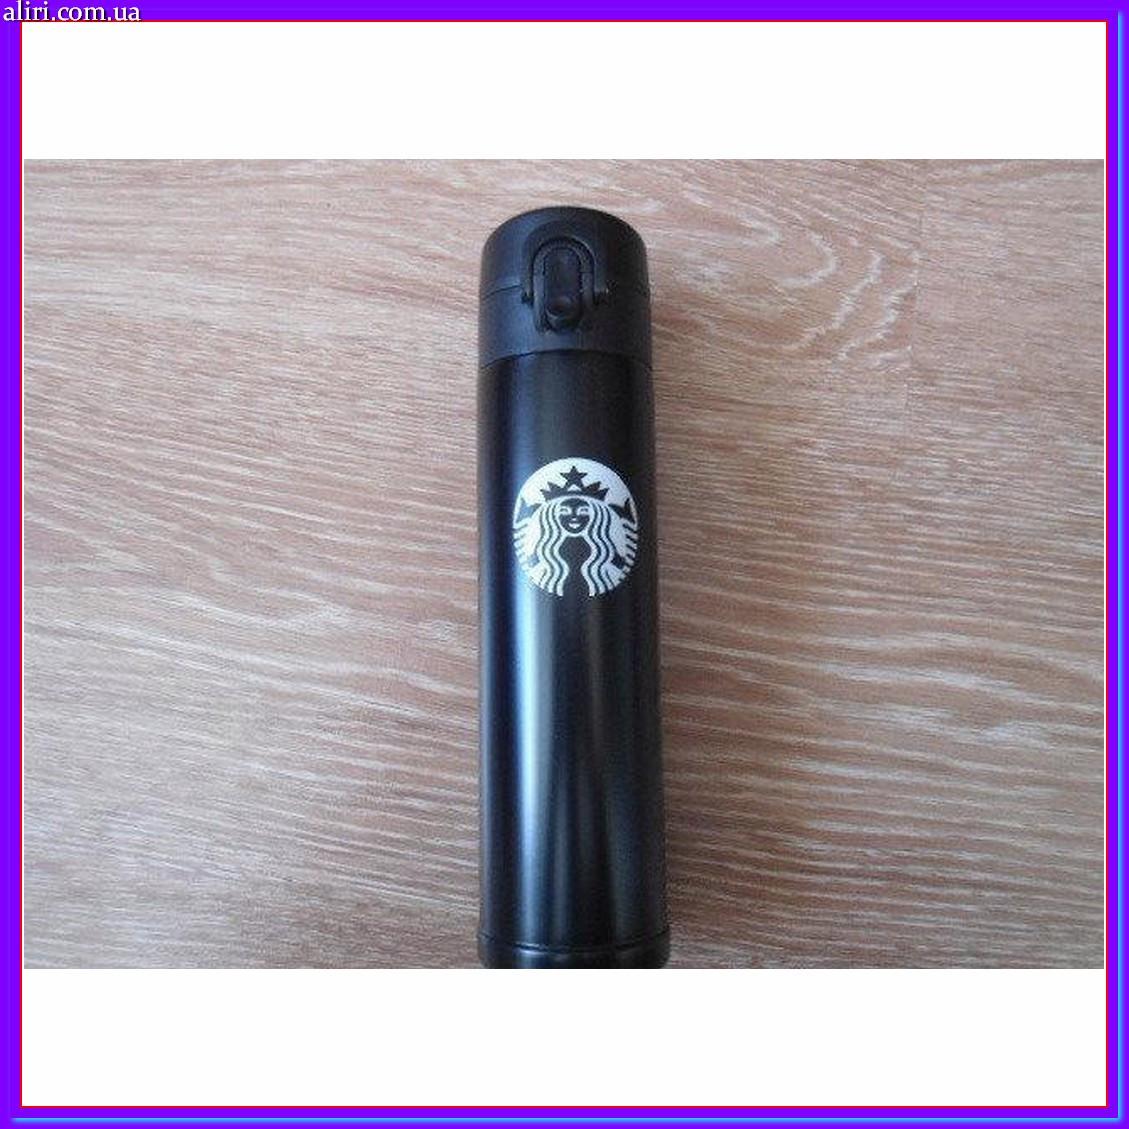 Термос Starbucks zk-b-106, термокружка черная